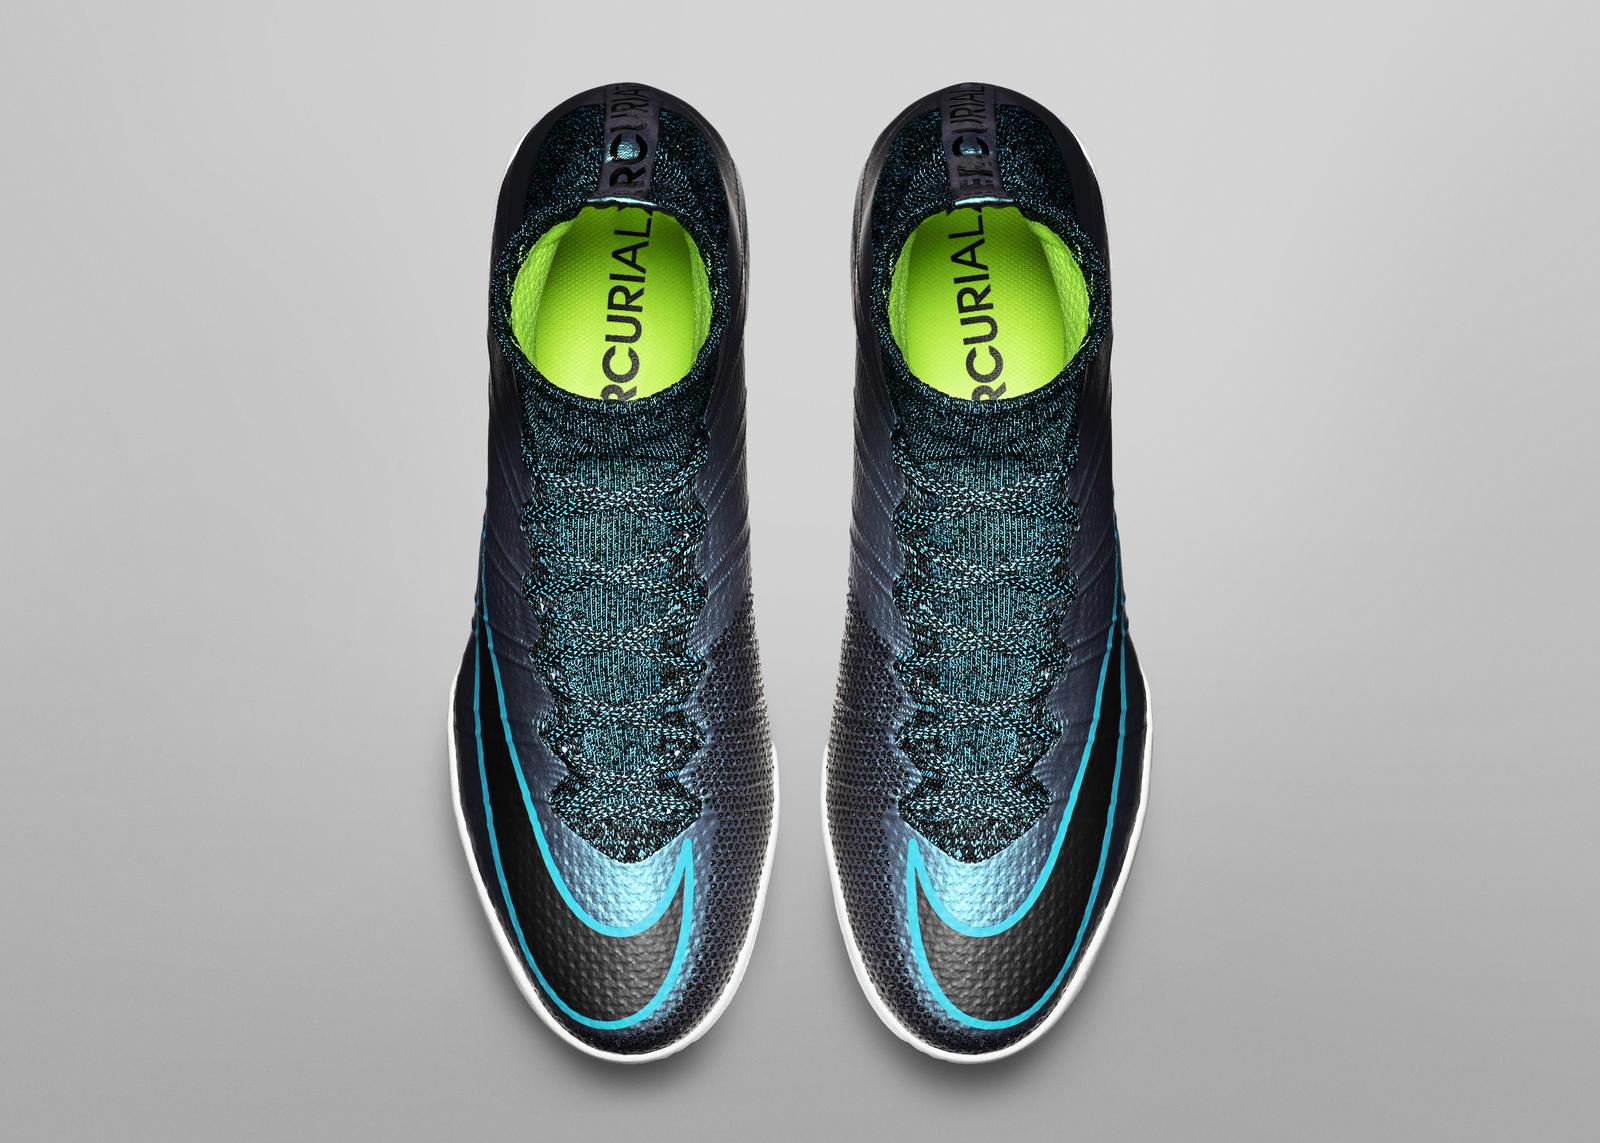 Nike Football Soccer Electro Flare Mercurialx Proximo Tf D Prem